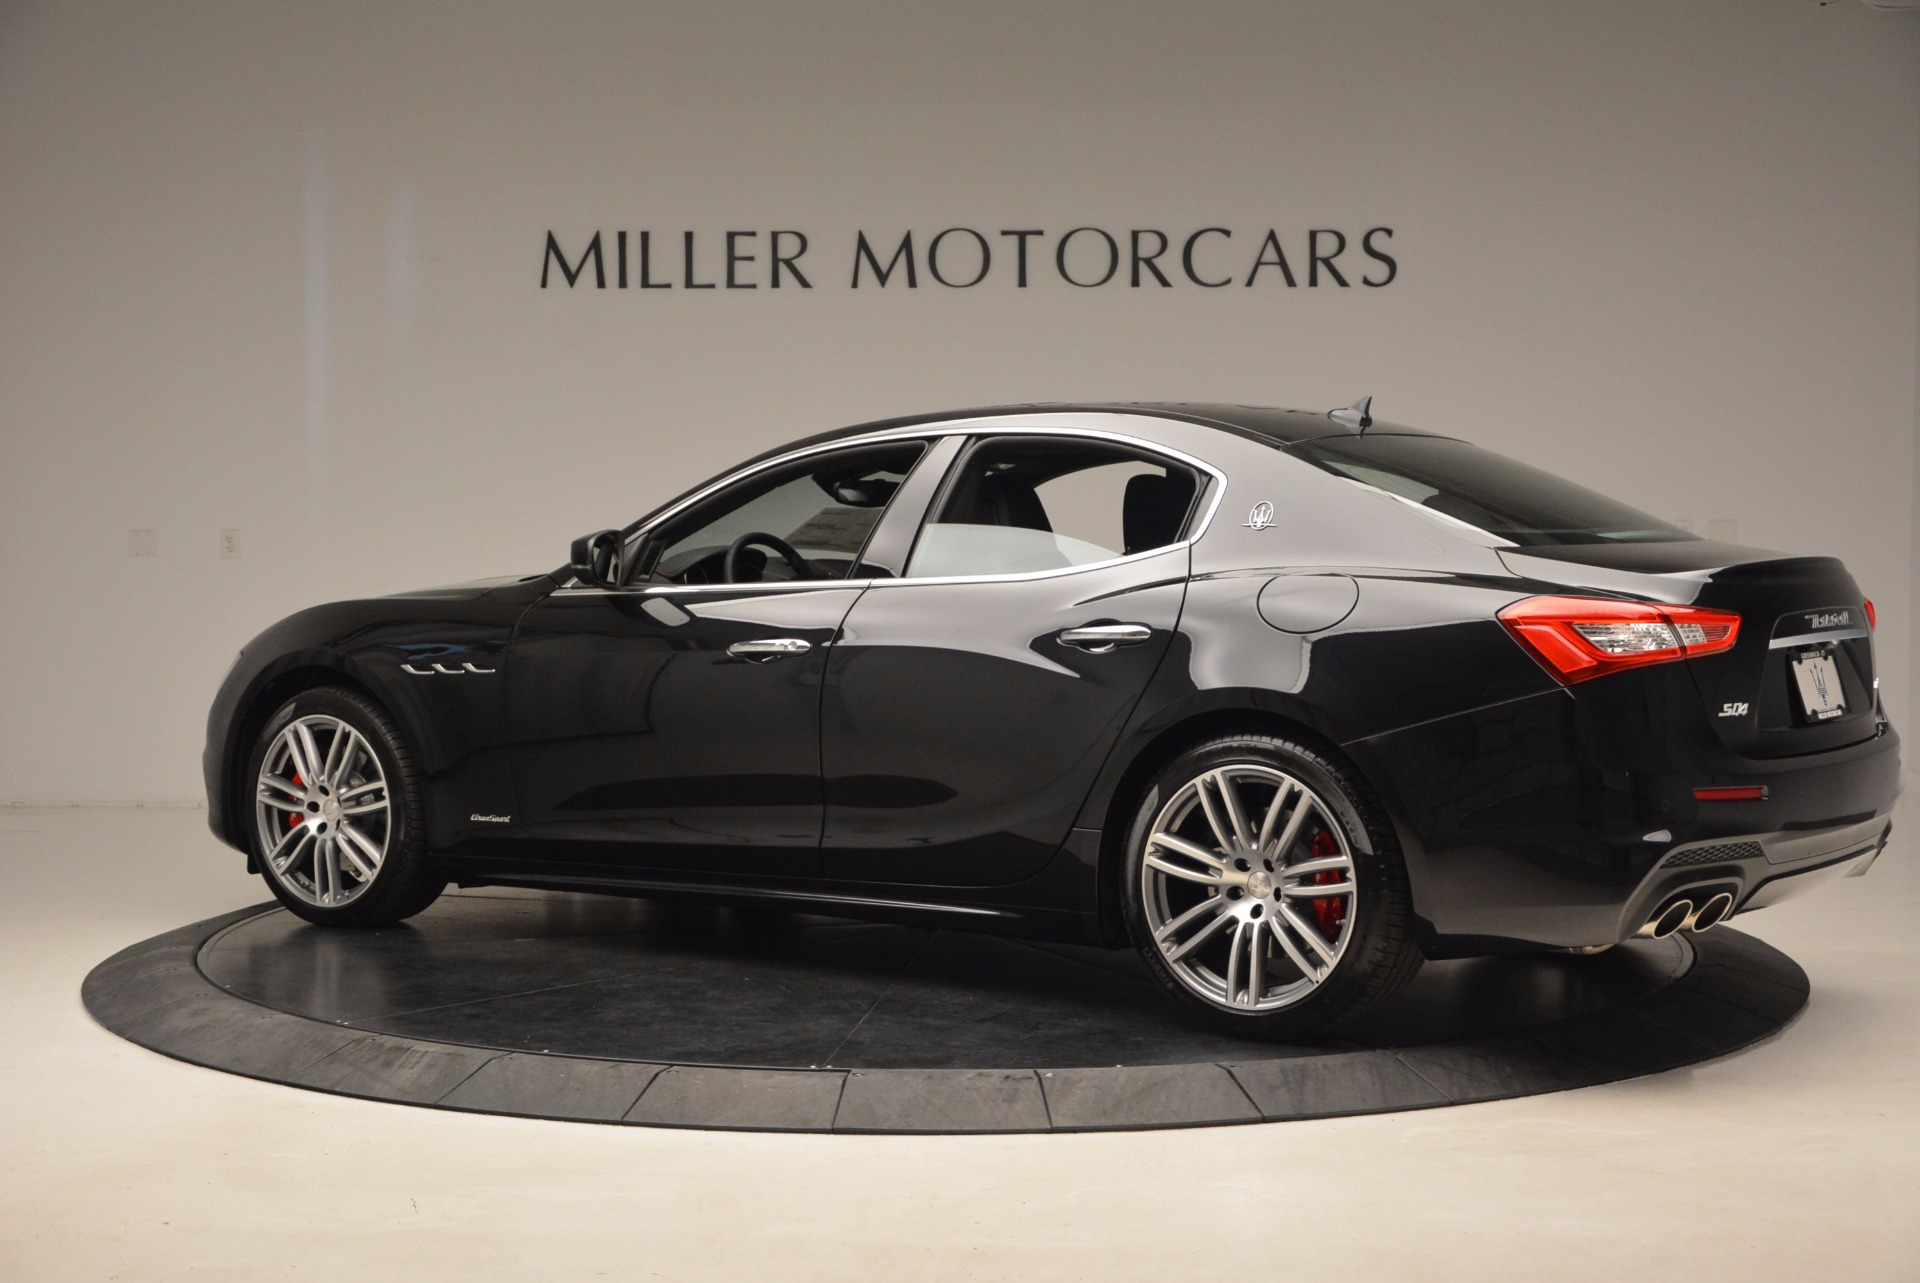 New 2018 Maserati Ghibli S Q4 Gransport For Sale In Westport, CT 1855_p4